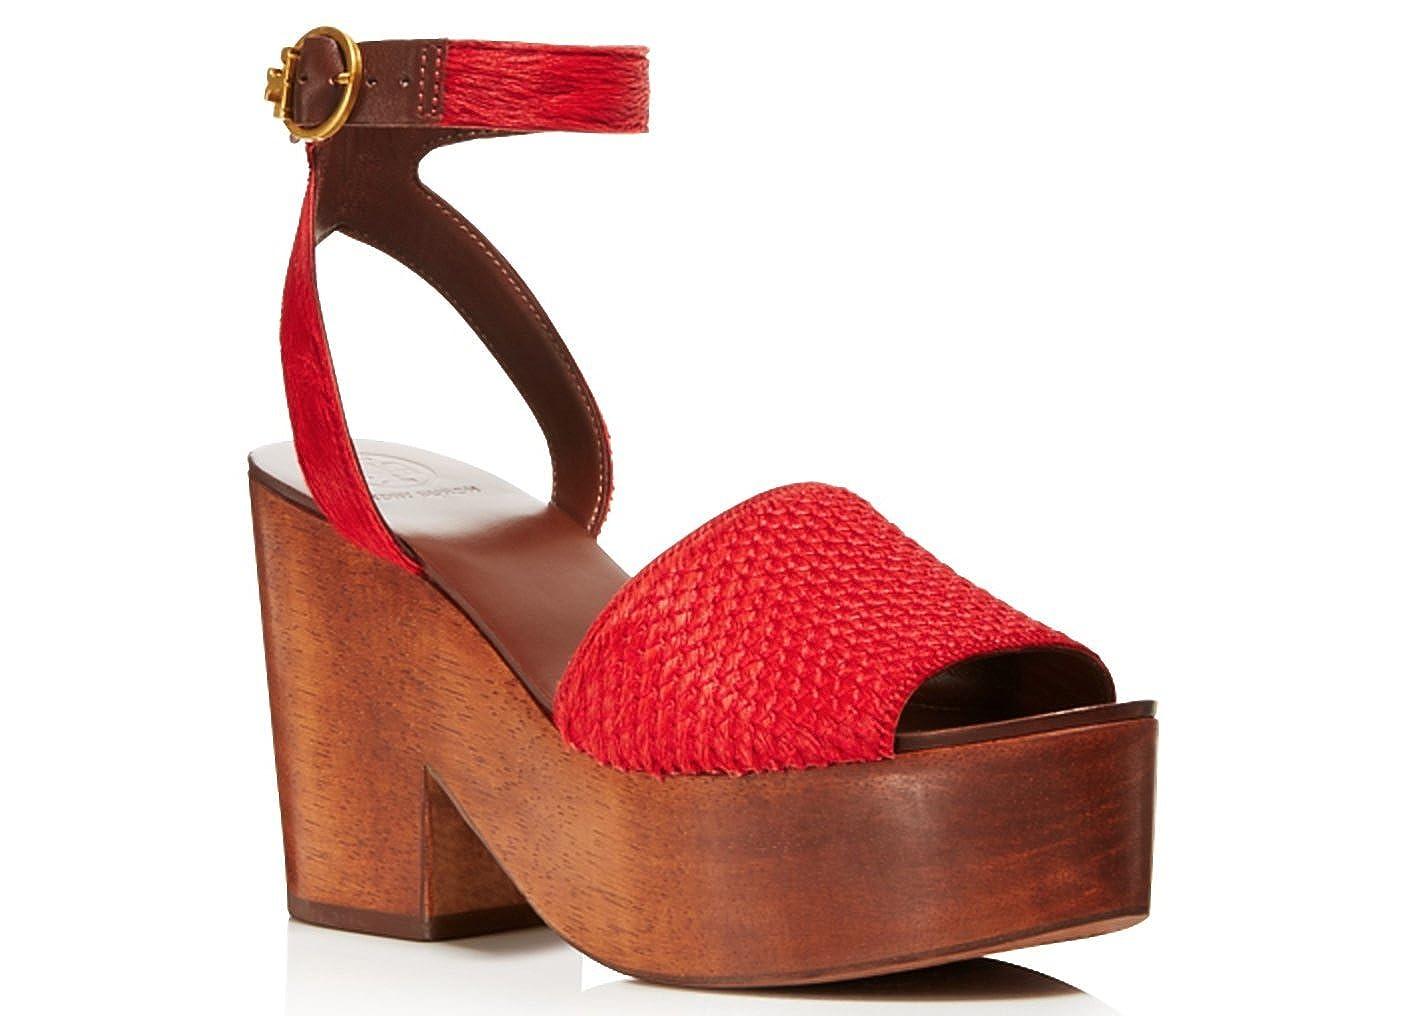 Tory Burch Camilla Sandals Exotic Red B078X4HGZZ 6 B(M) US